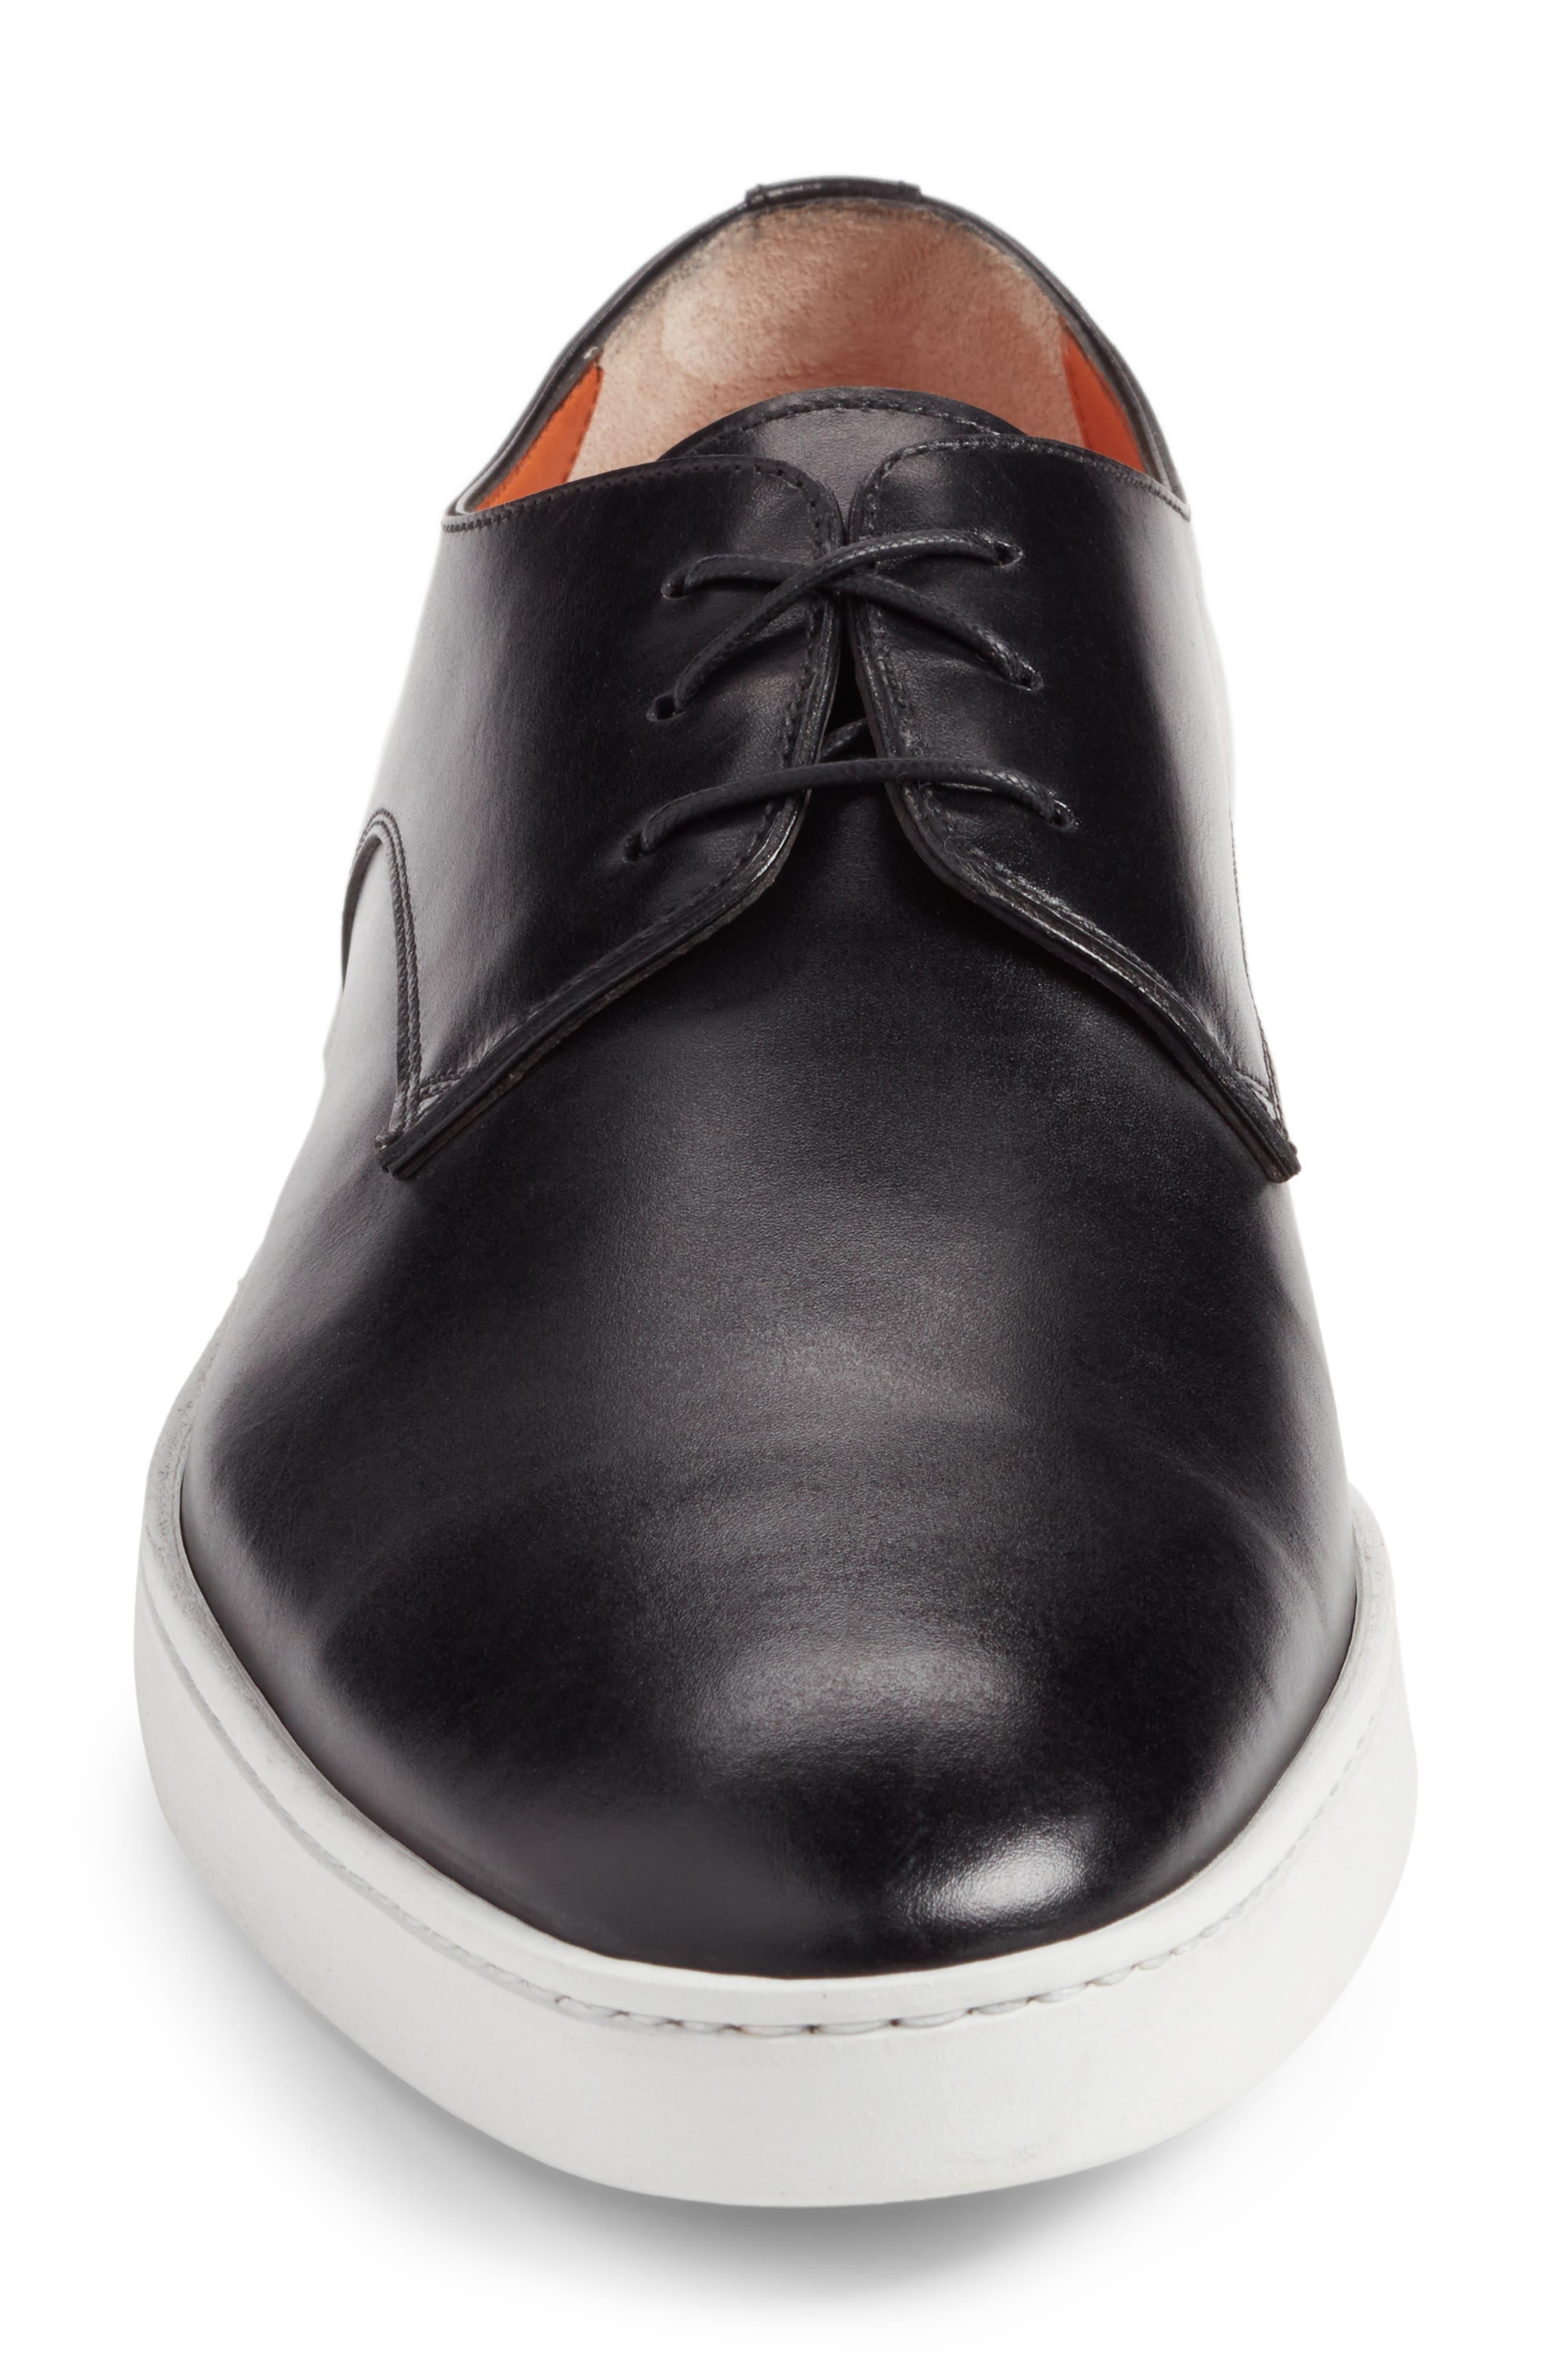 Doyle Sneaker,                             Alternate thumbnail 4, color,                             BLACK LEATHER